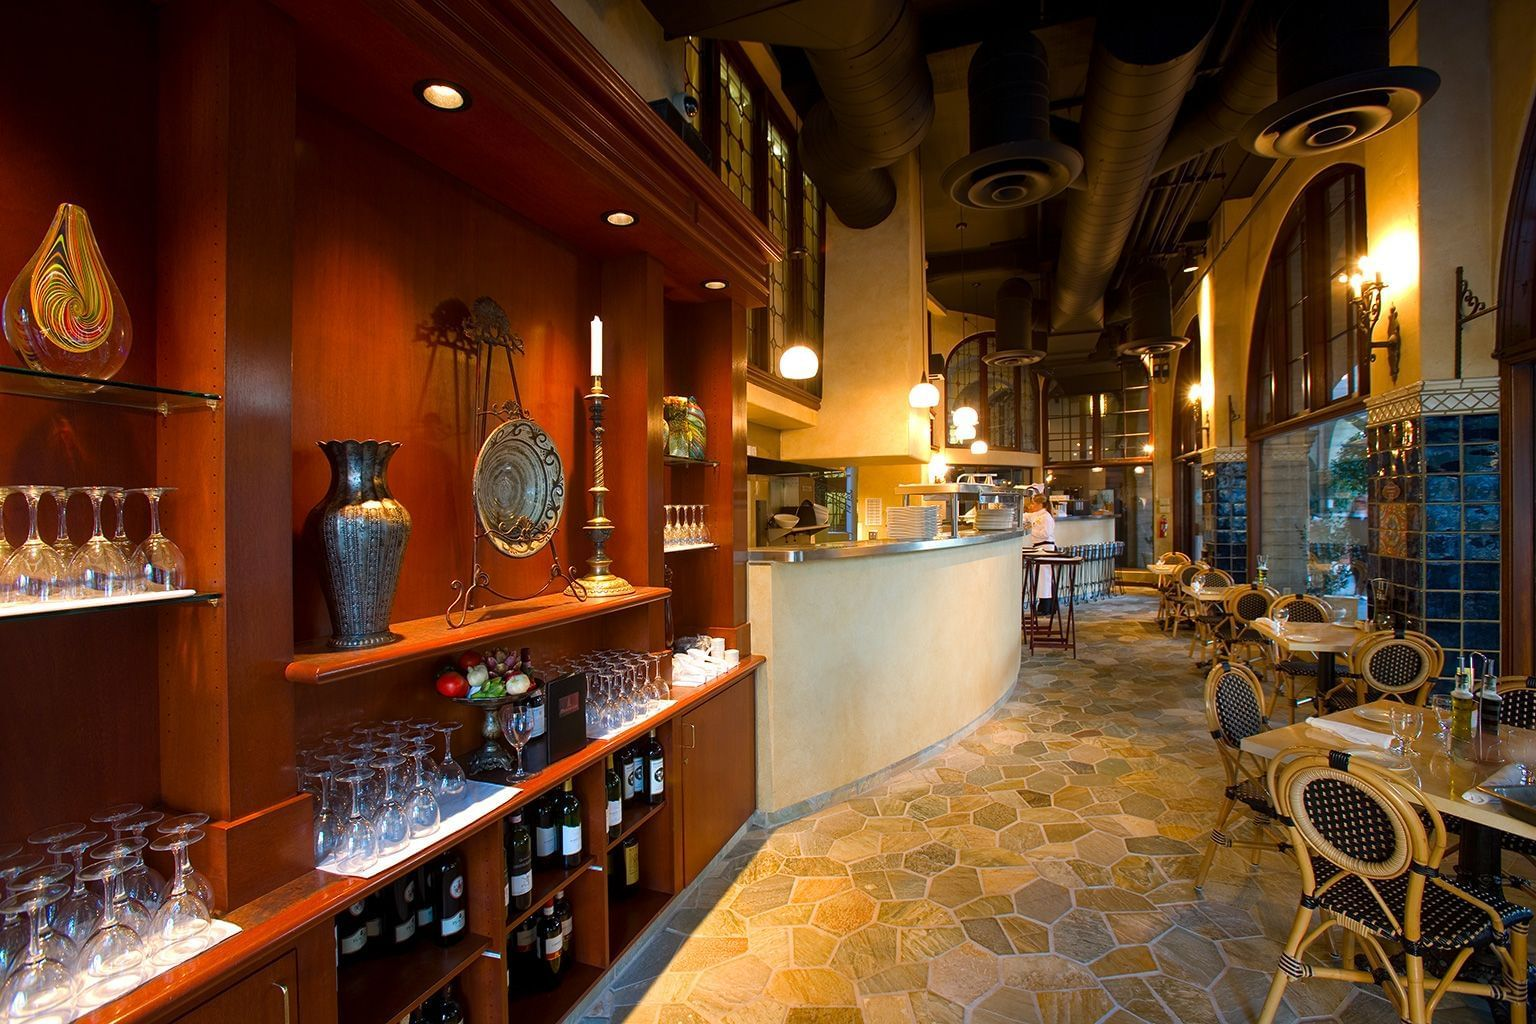 shelves of glasses and wine bottles near dining tables